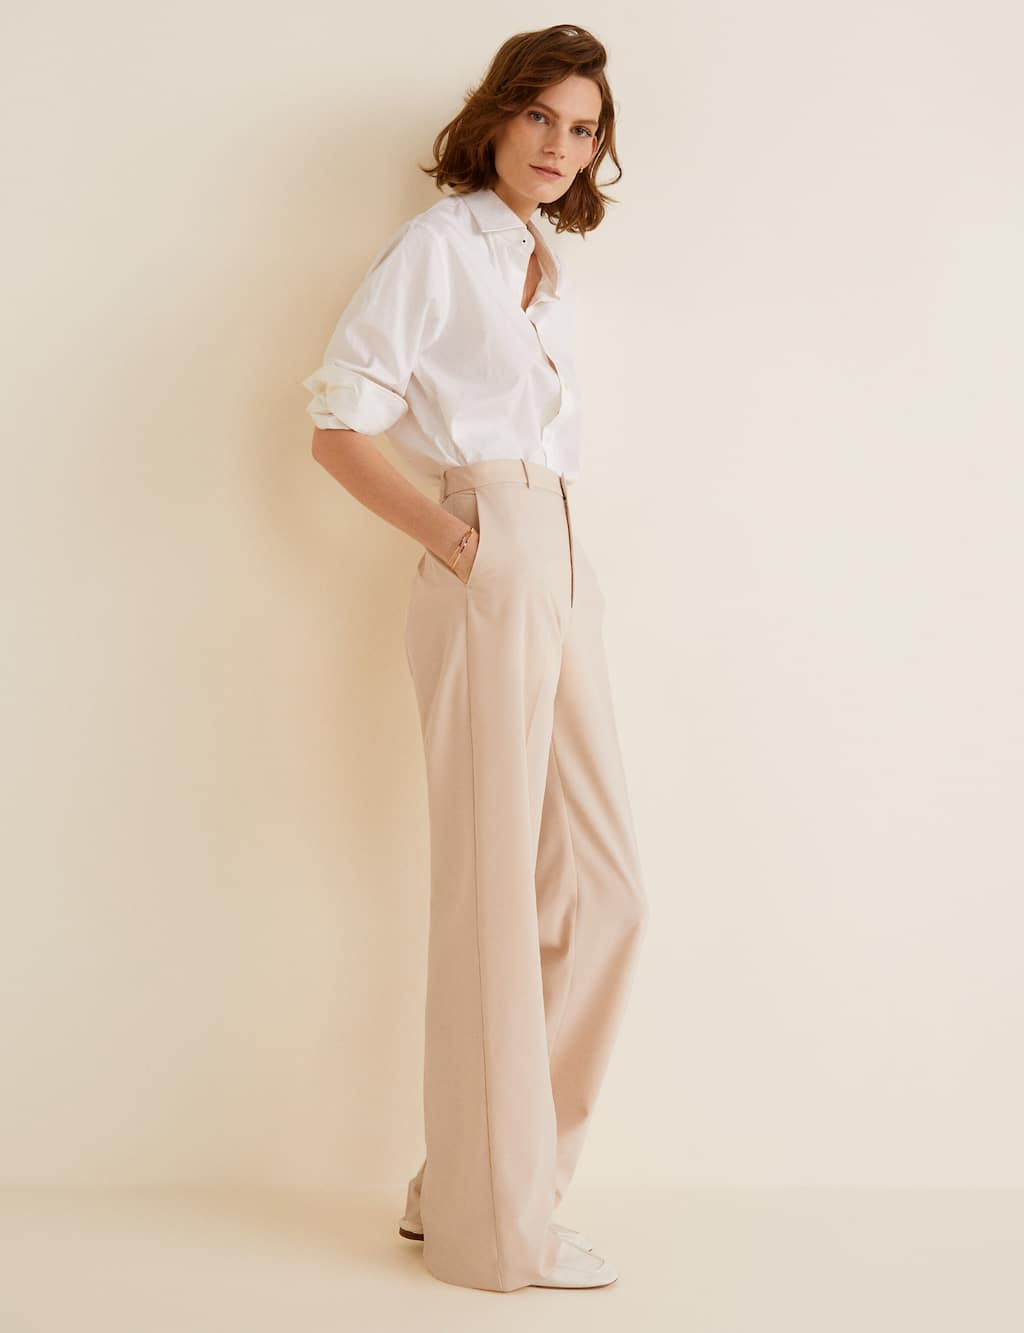 eaafefffaa Woman's Clothing Outlet | Mango Outlet United Kingdom